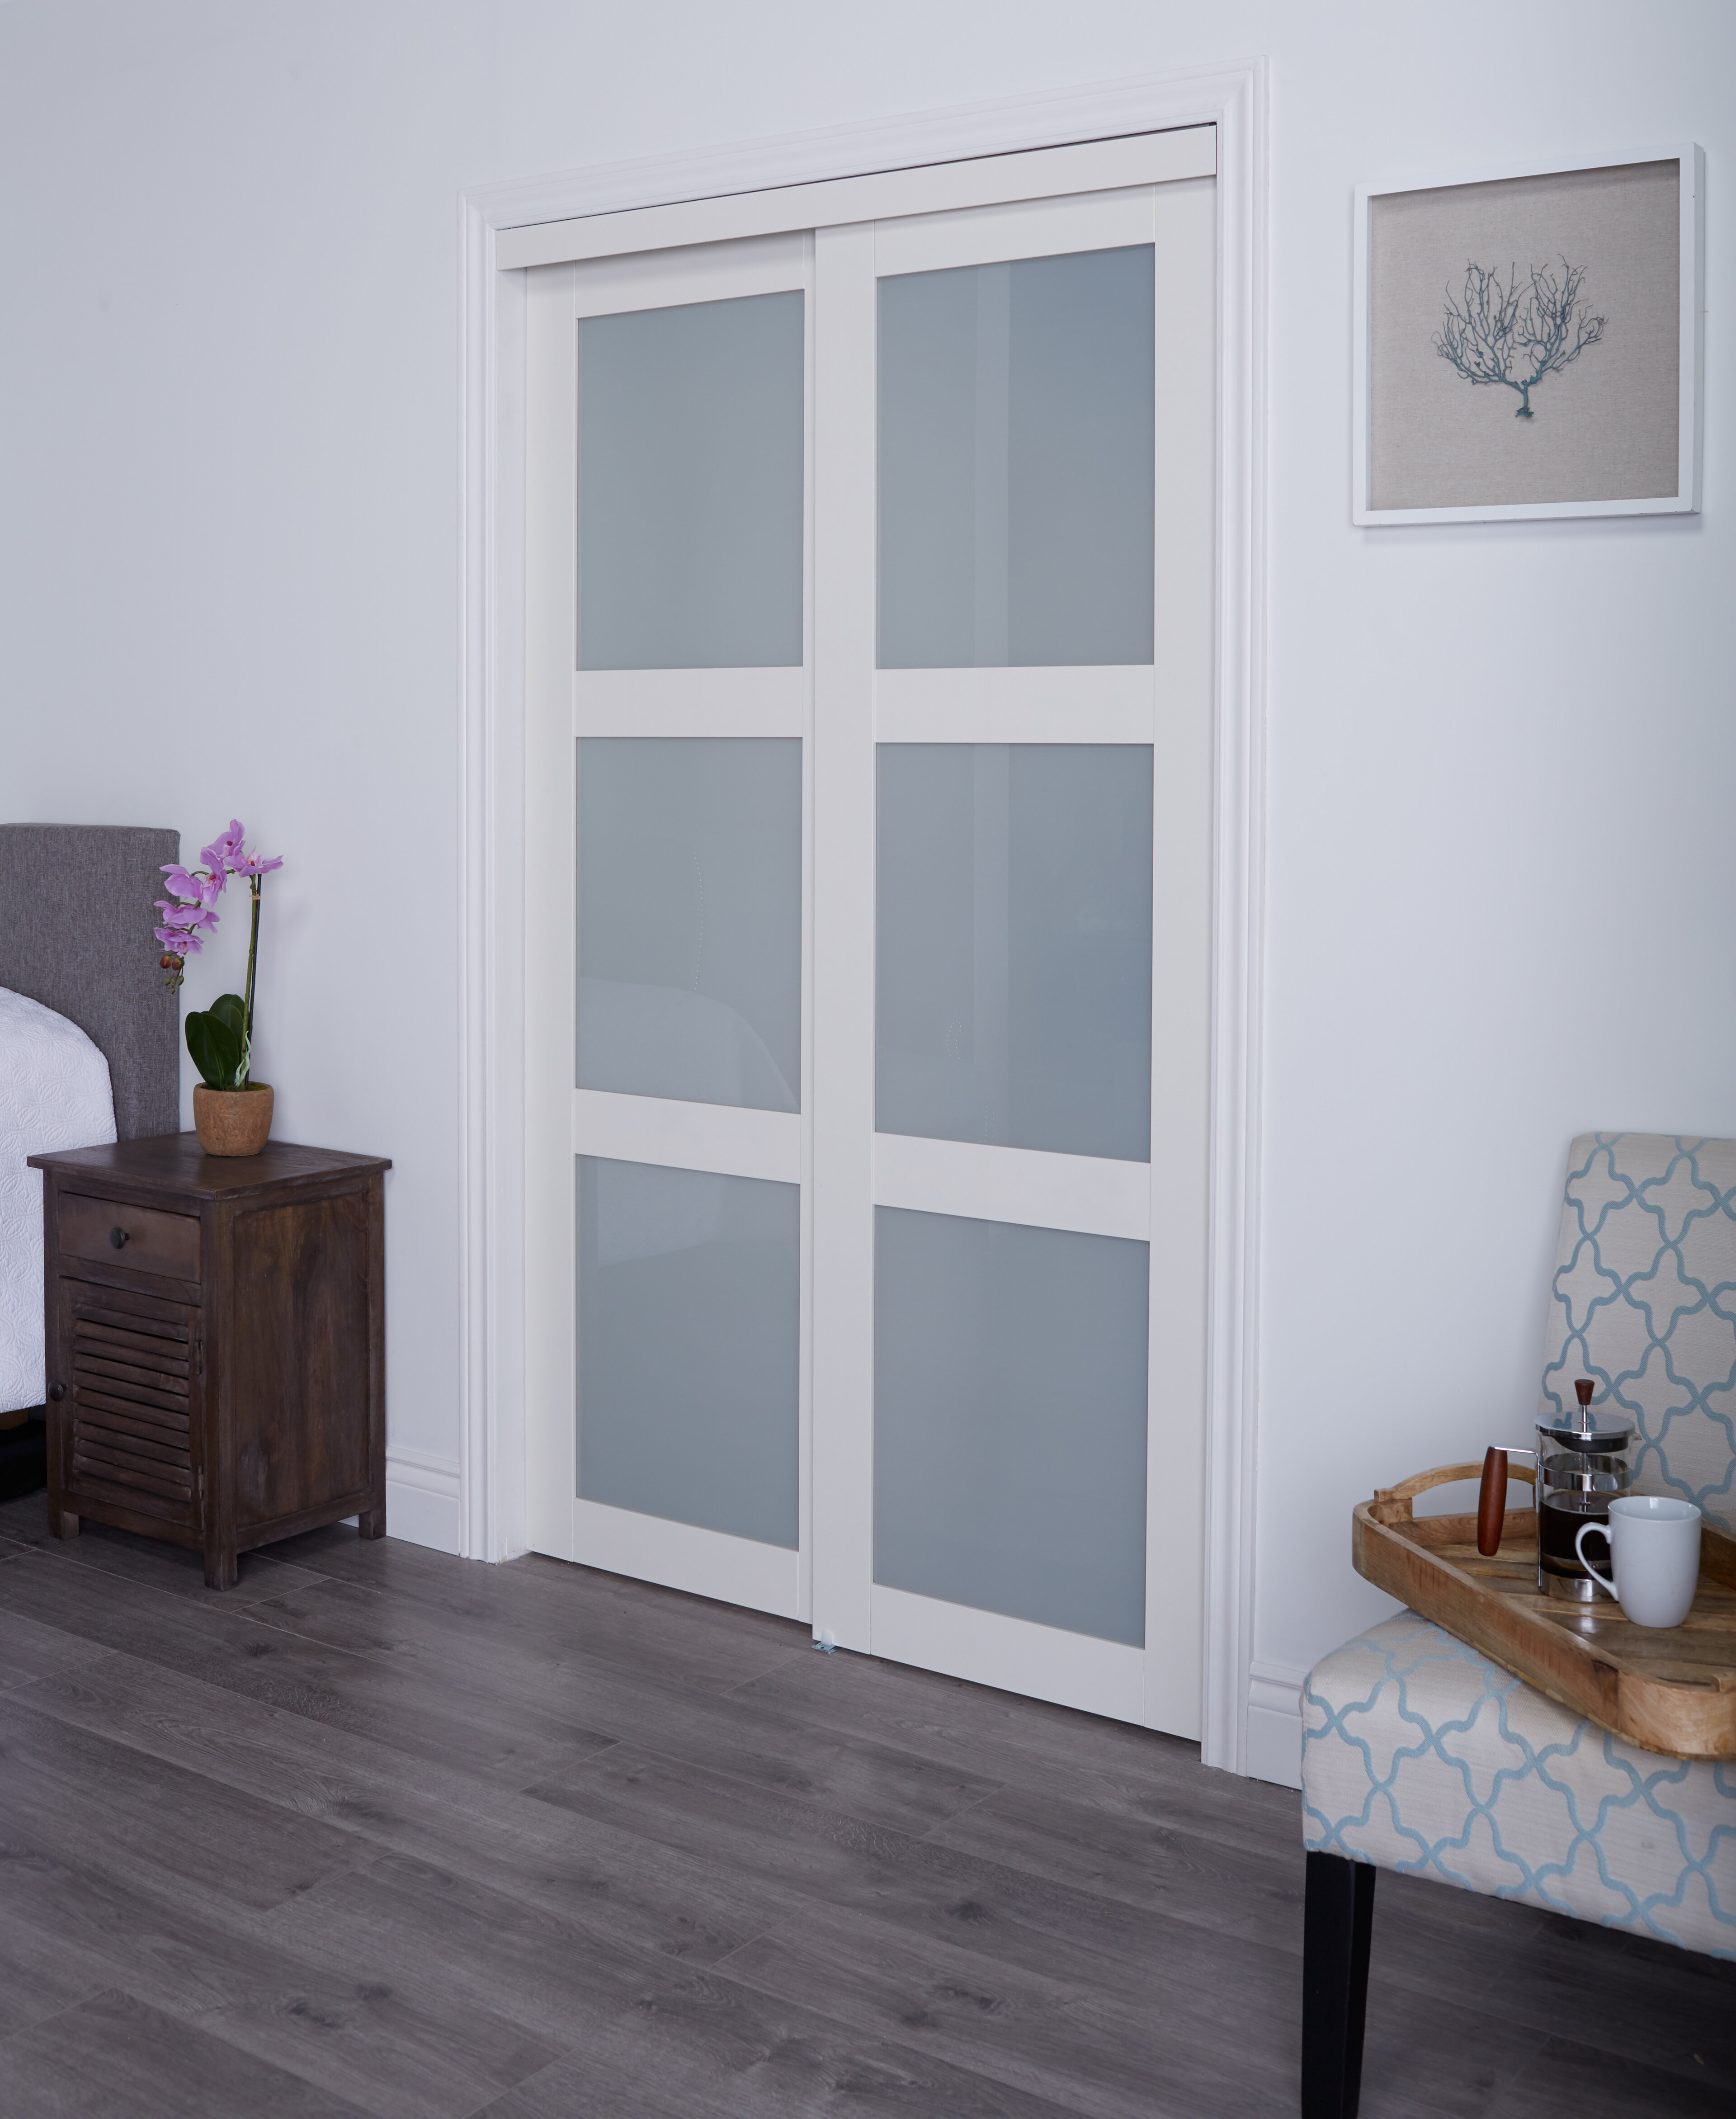 Good Erias Home Designs Baldarassario MDF 2 Panel Painted Sliding Interior Door  U0026 Reviews | Wayfair